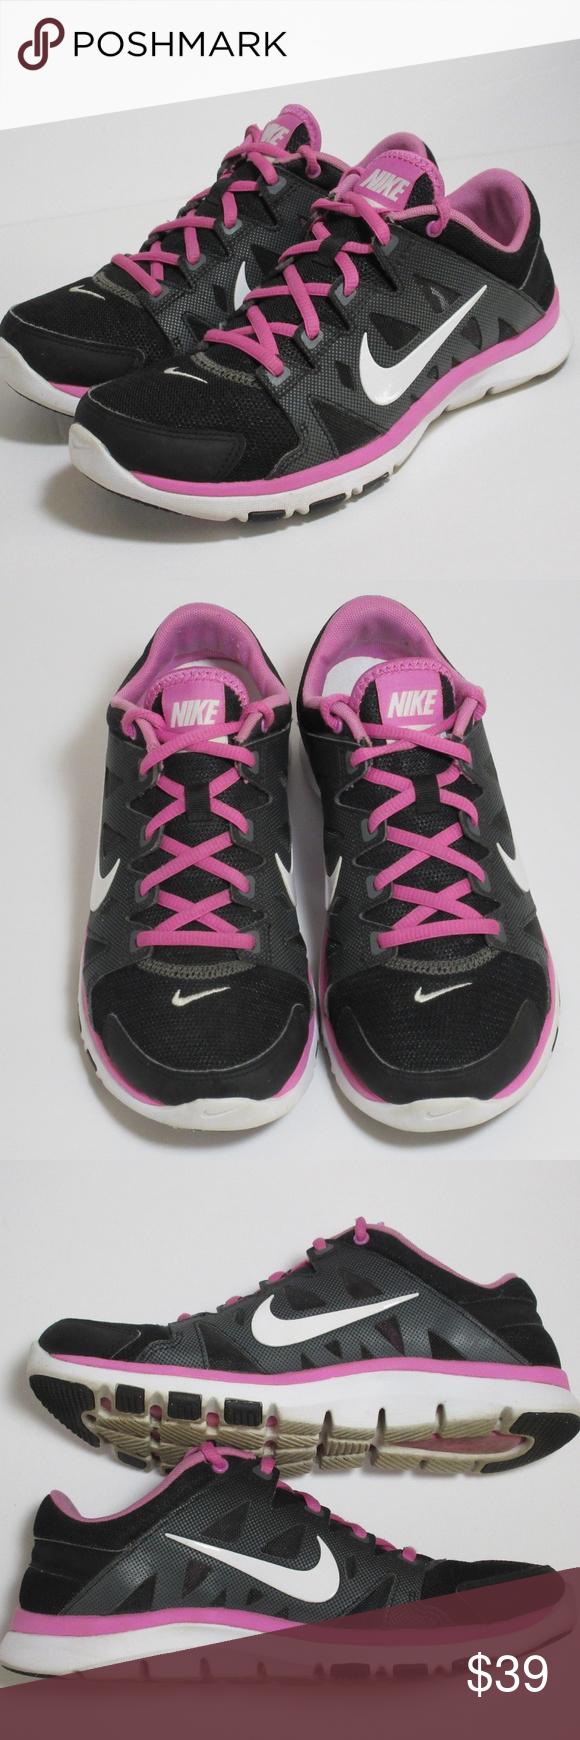 Calendario ensayo Lógico  Nike Flex Supreme Fitsole Training Shoes Size 7 | Nike flex, Training  shoes, Shoes